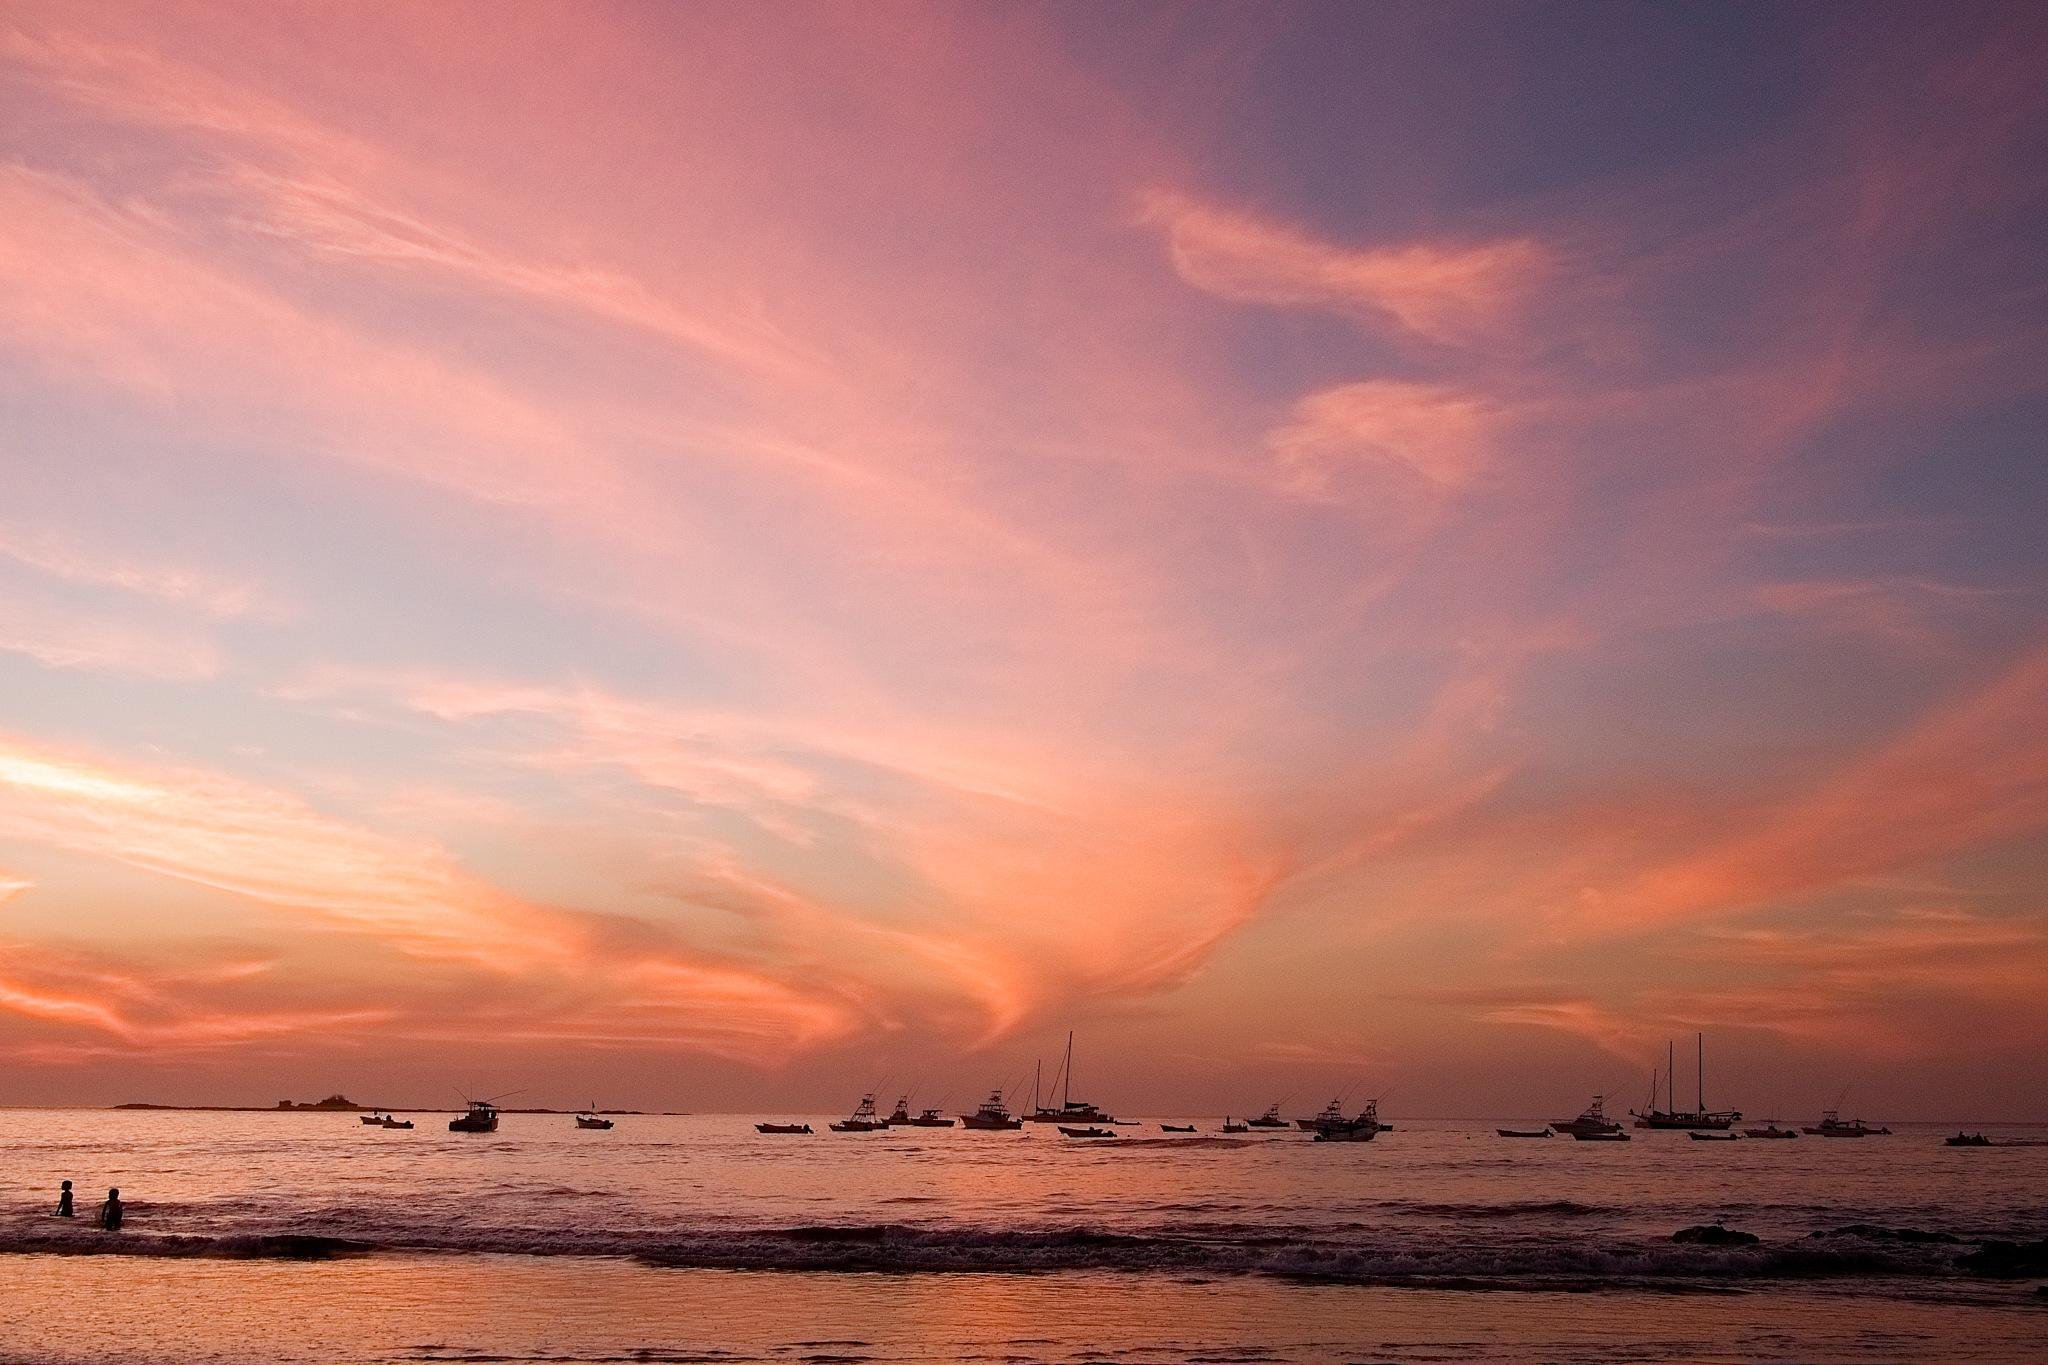 Sunset no. 3 Tamarindo Bay by Smilin' Dog